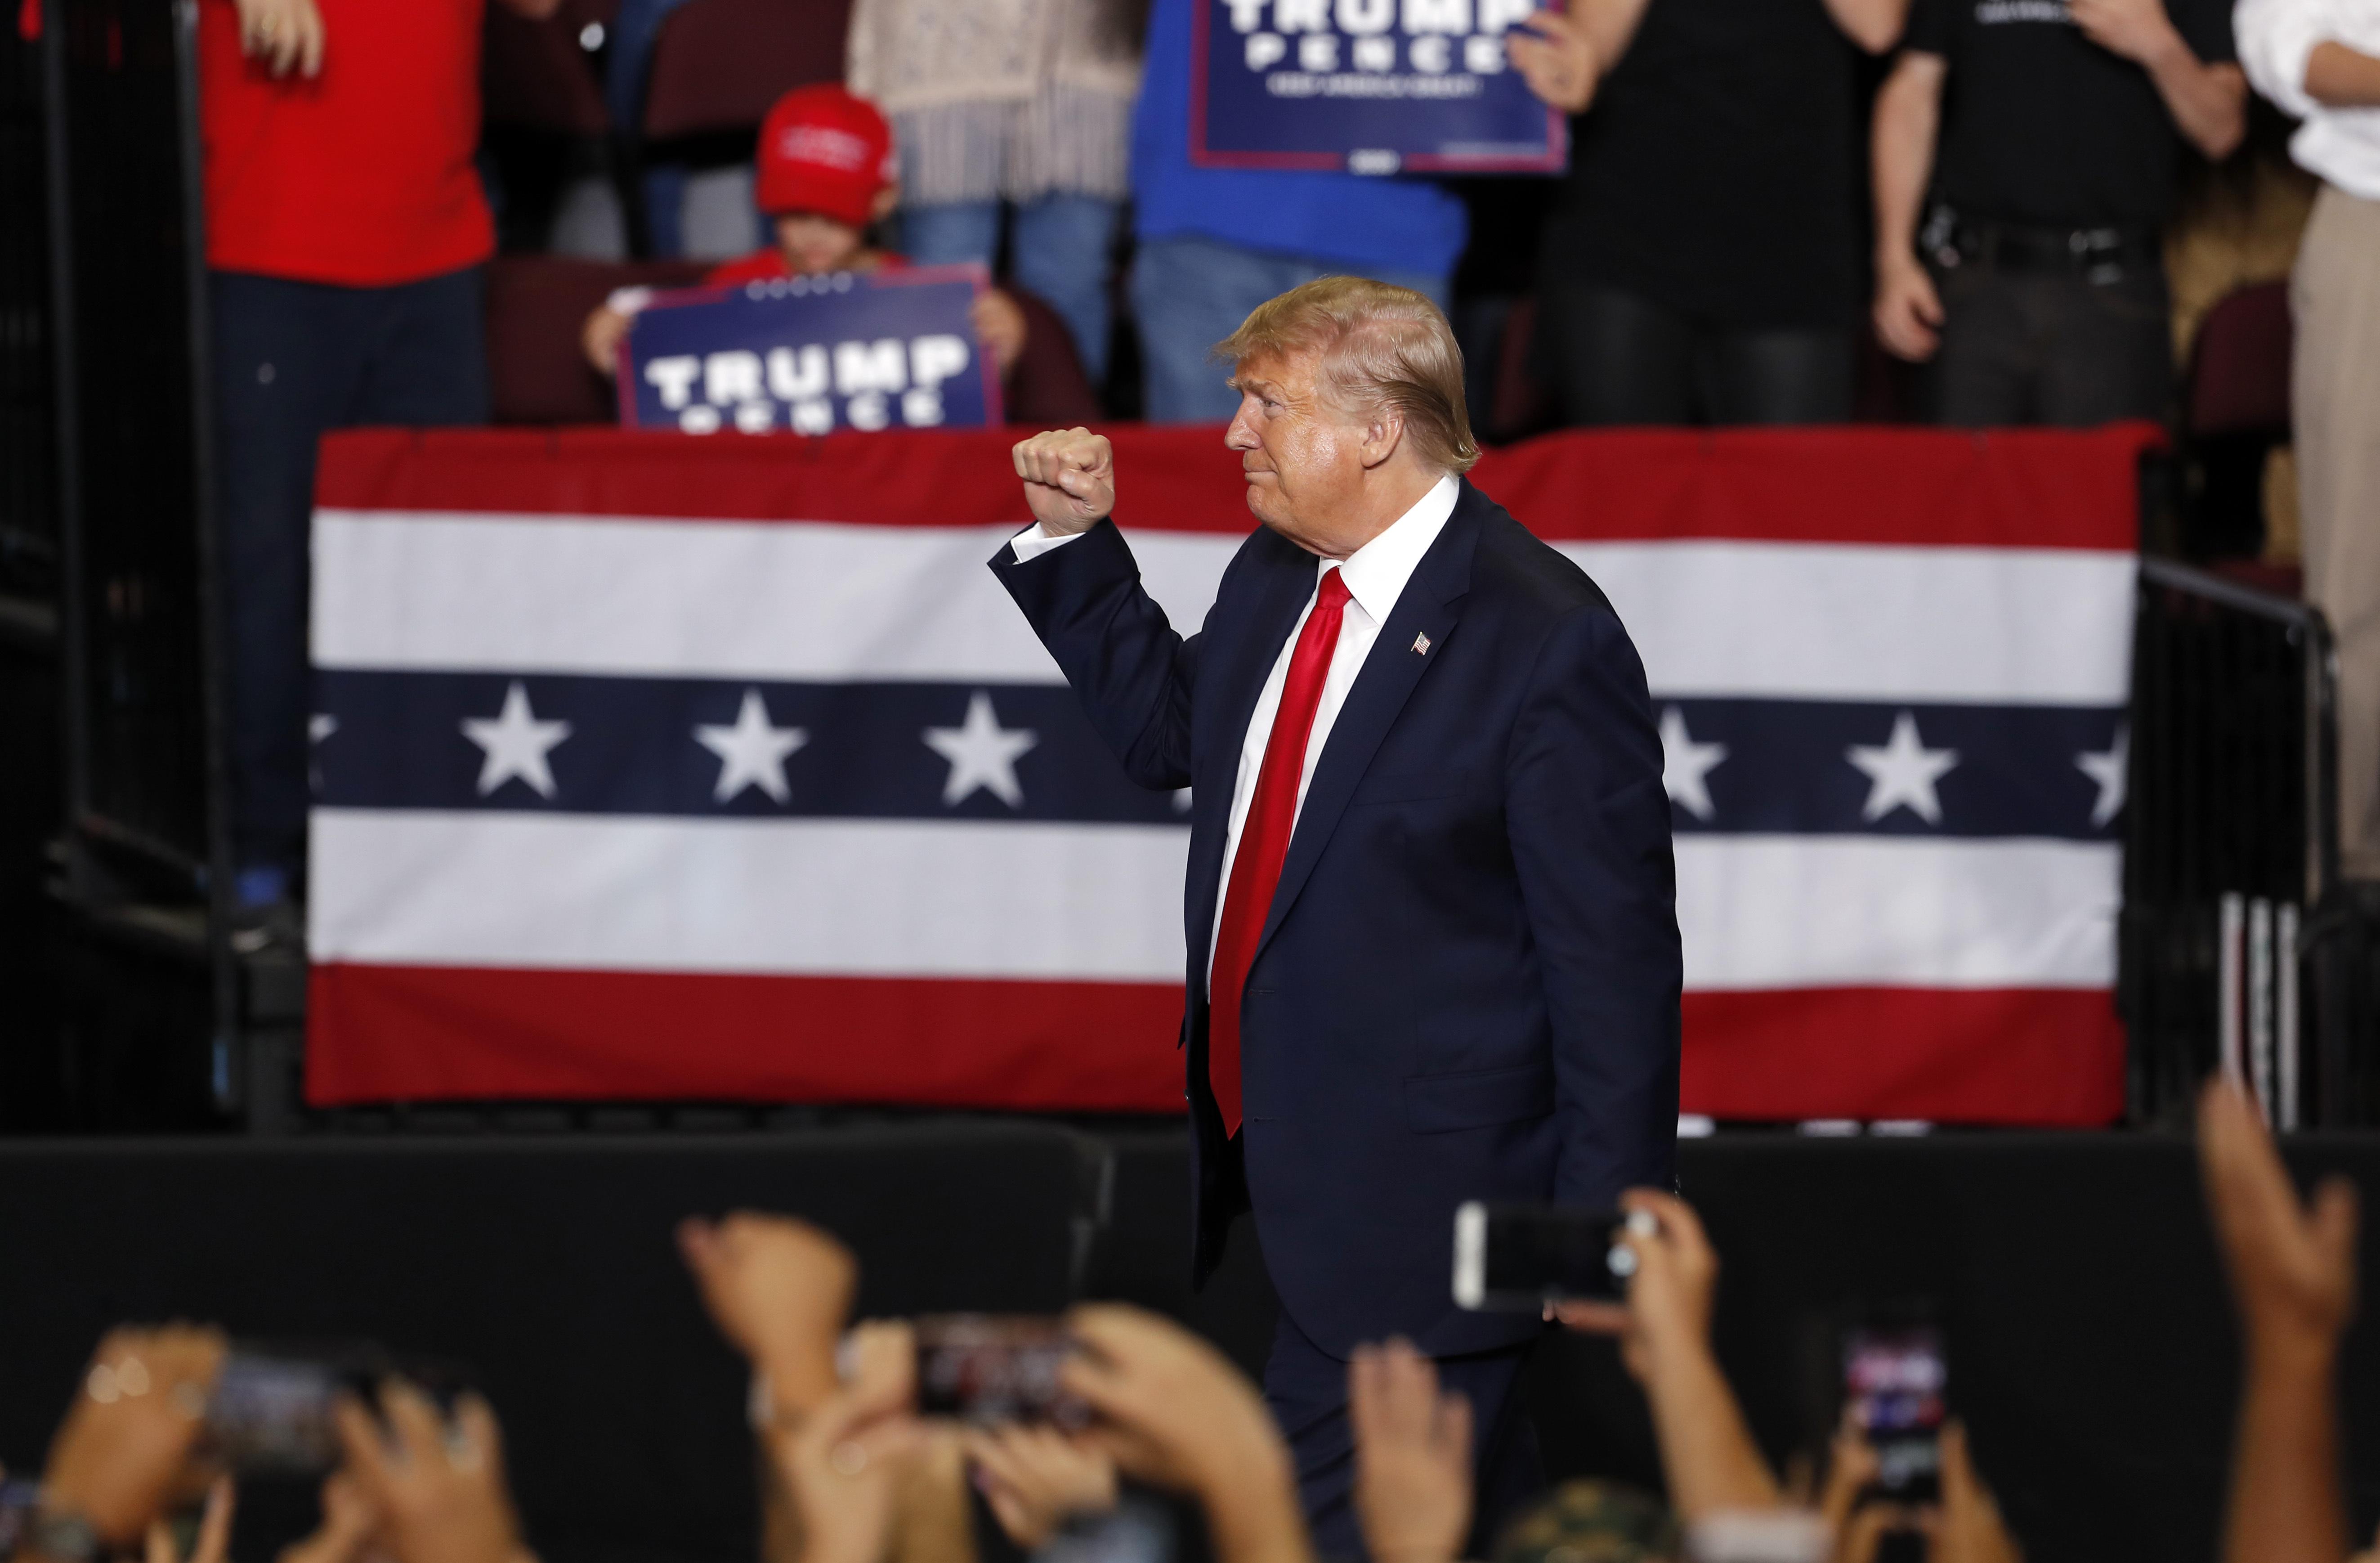 Trump campaign says delegate overhaul will ease 2020 bid